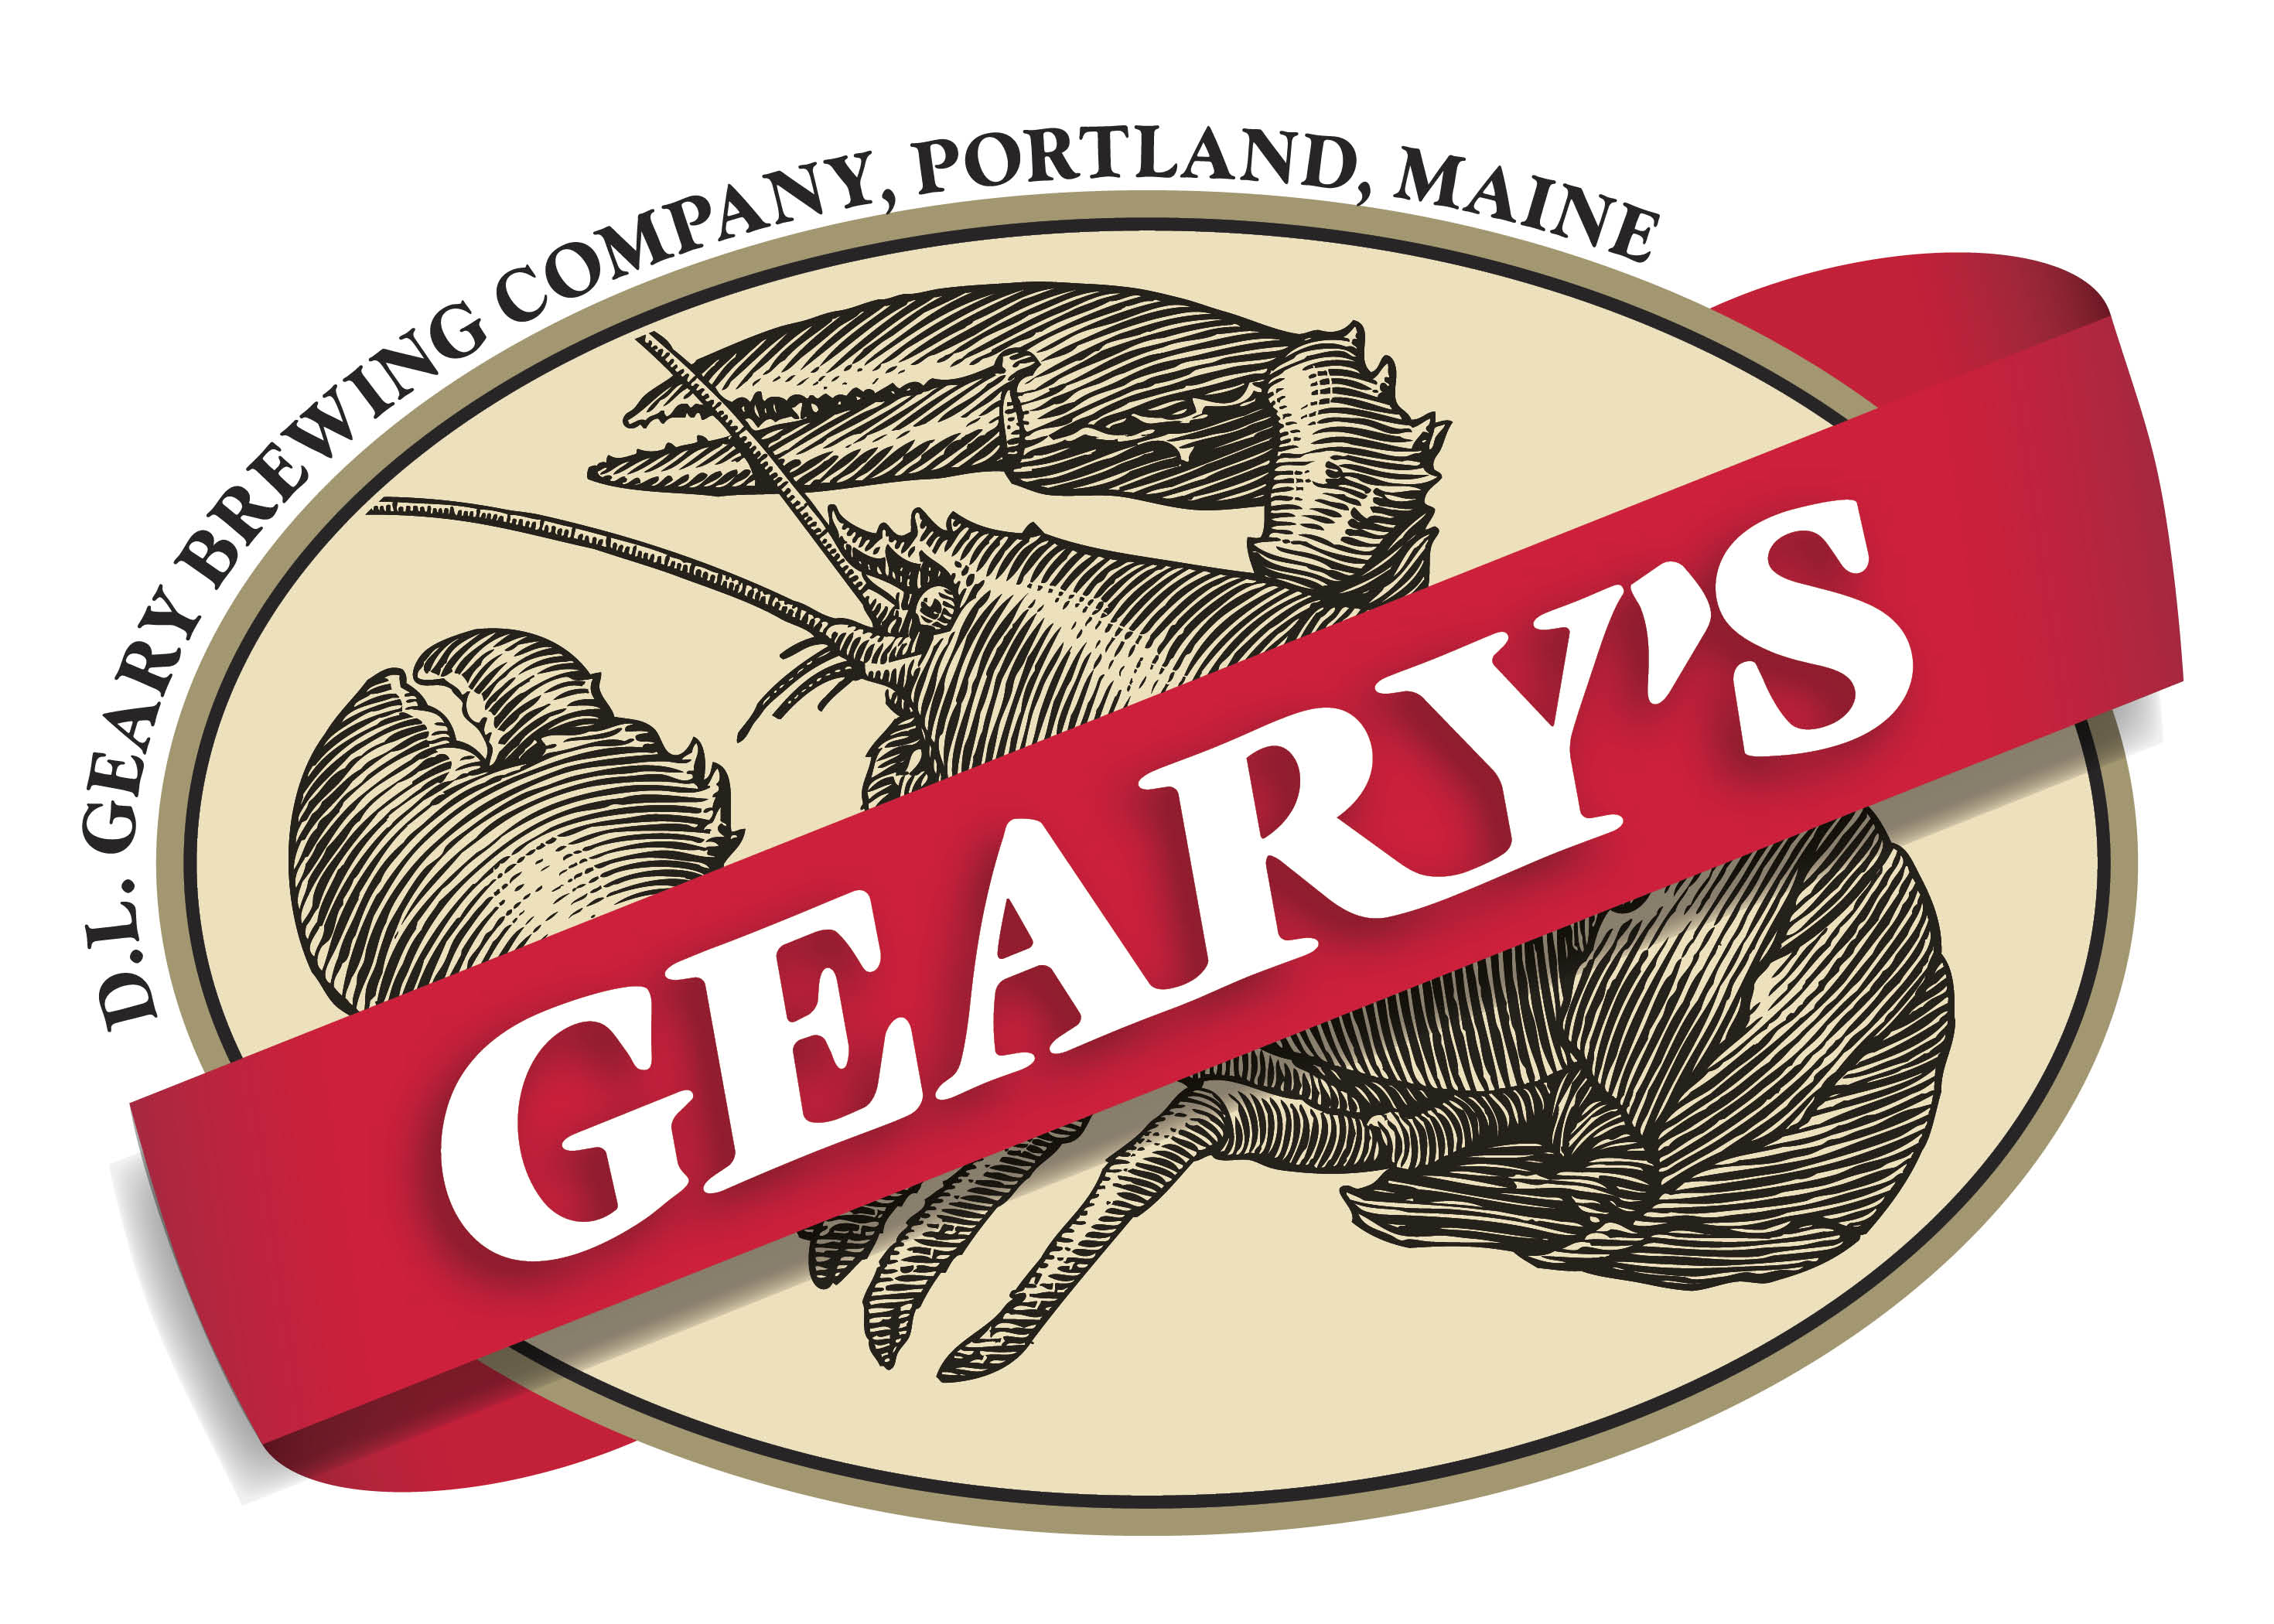 Gearys horizontal